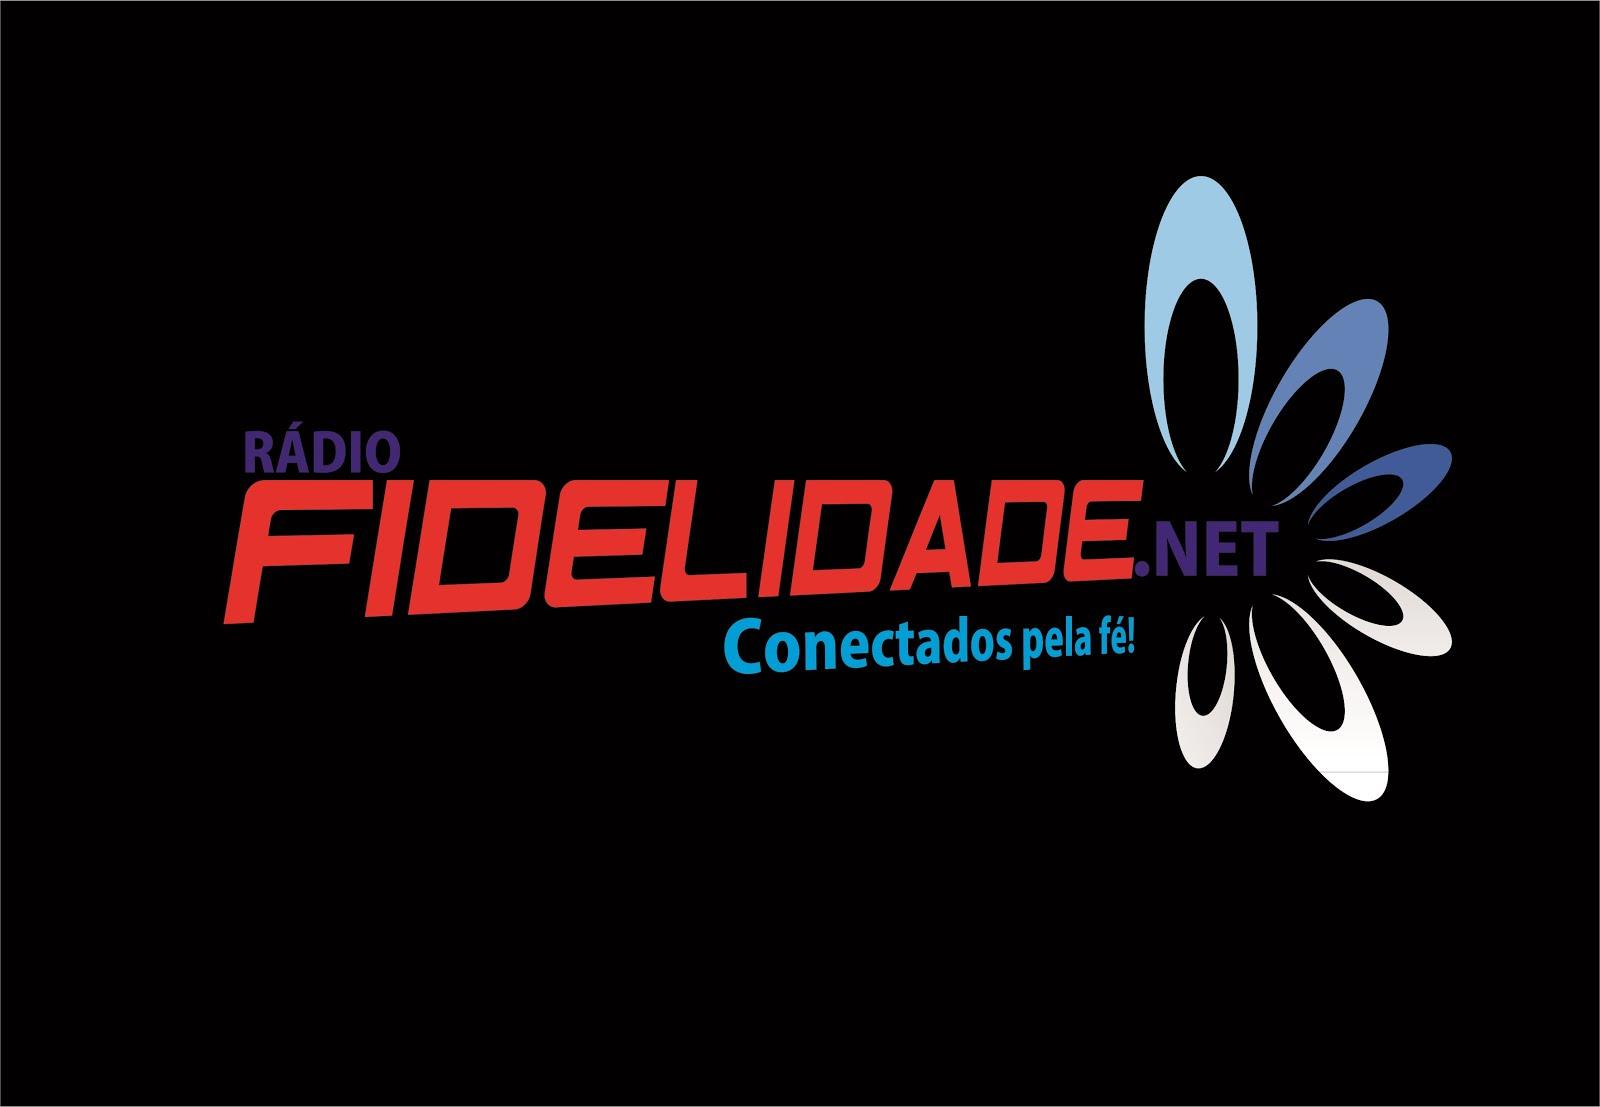 RADIO FIDELIDADE